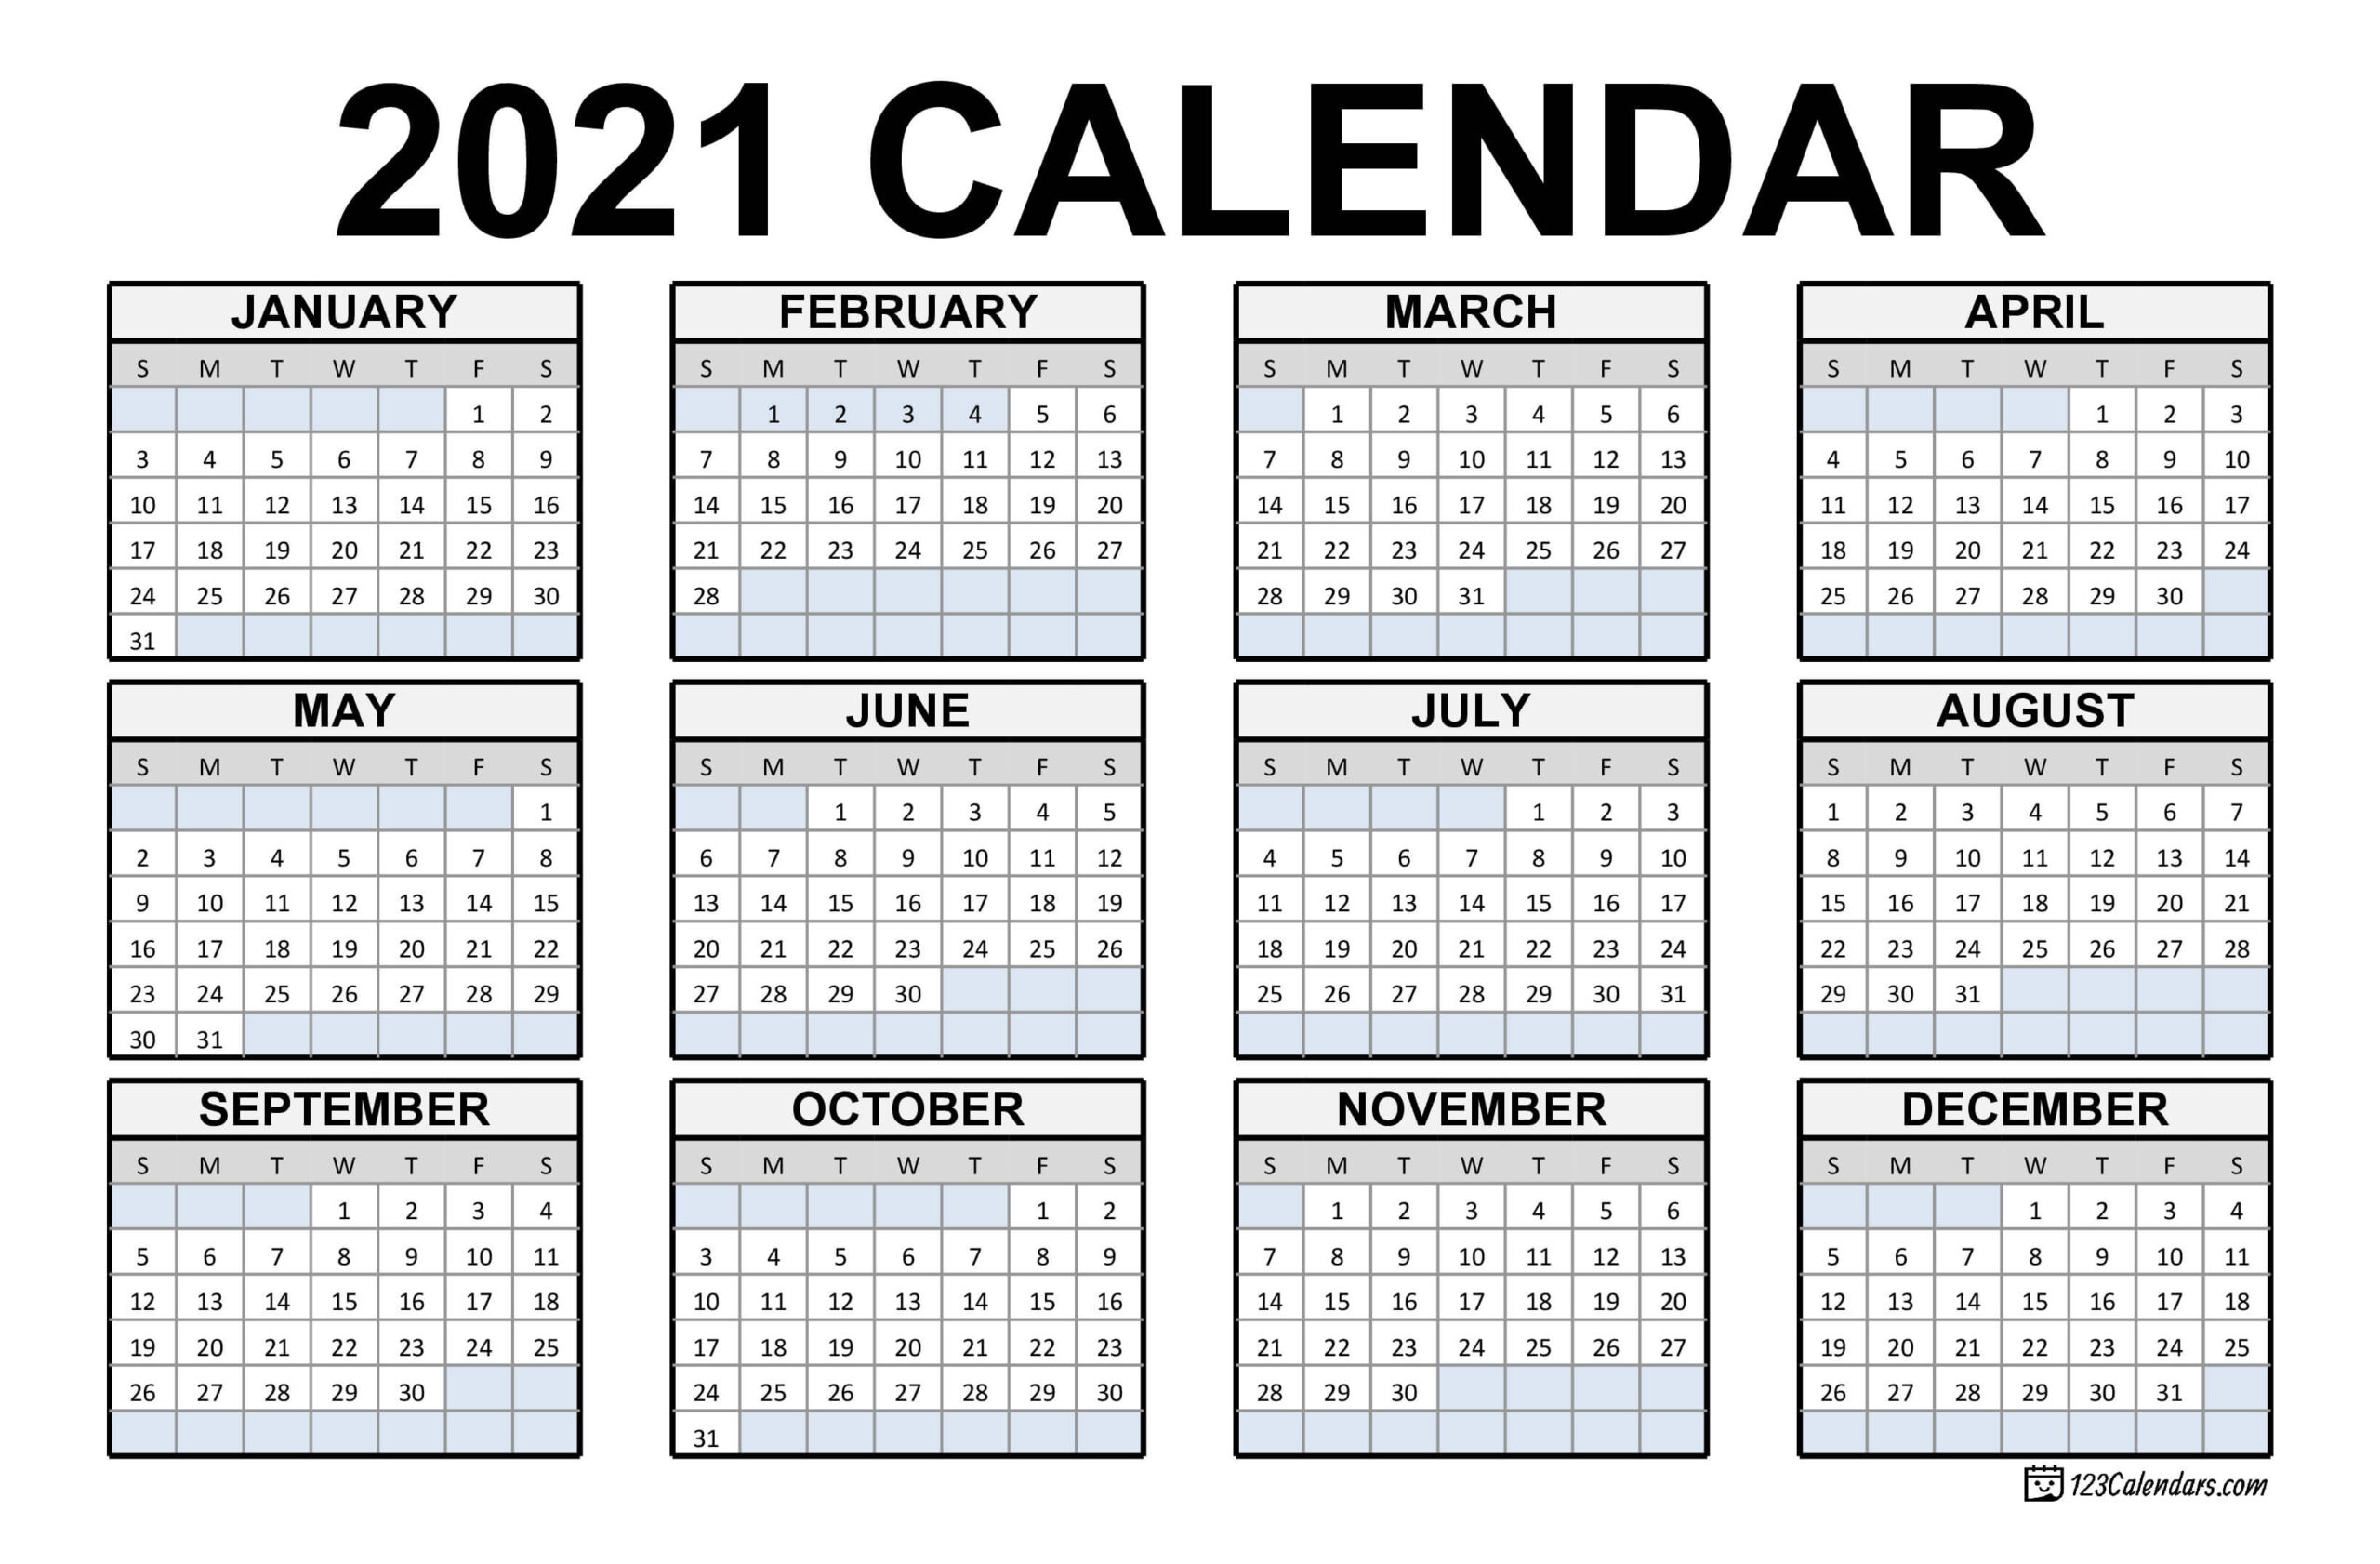 2021 Printable Calendar | 123Calendars intended for Fill In Calendar 2021 Printable